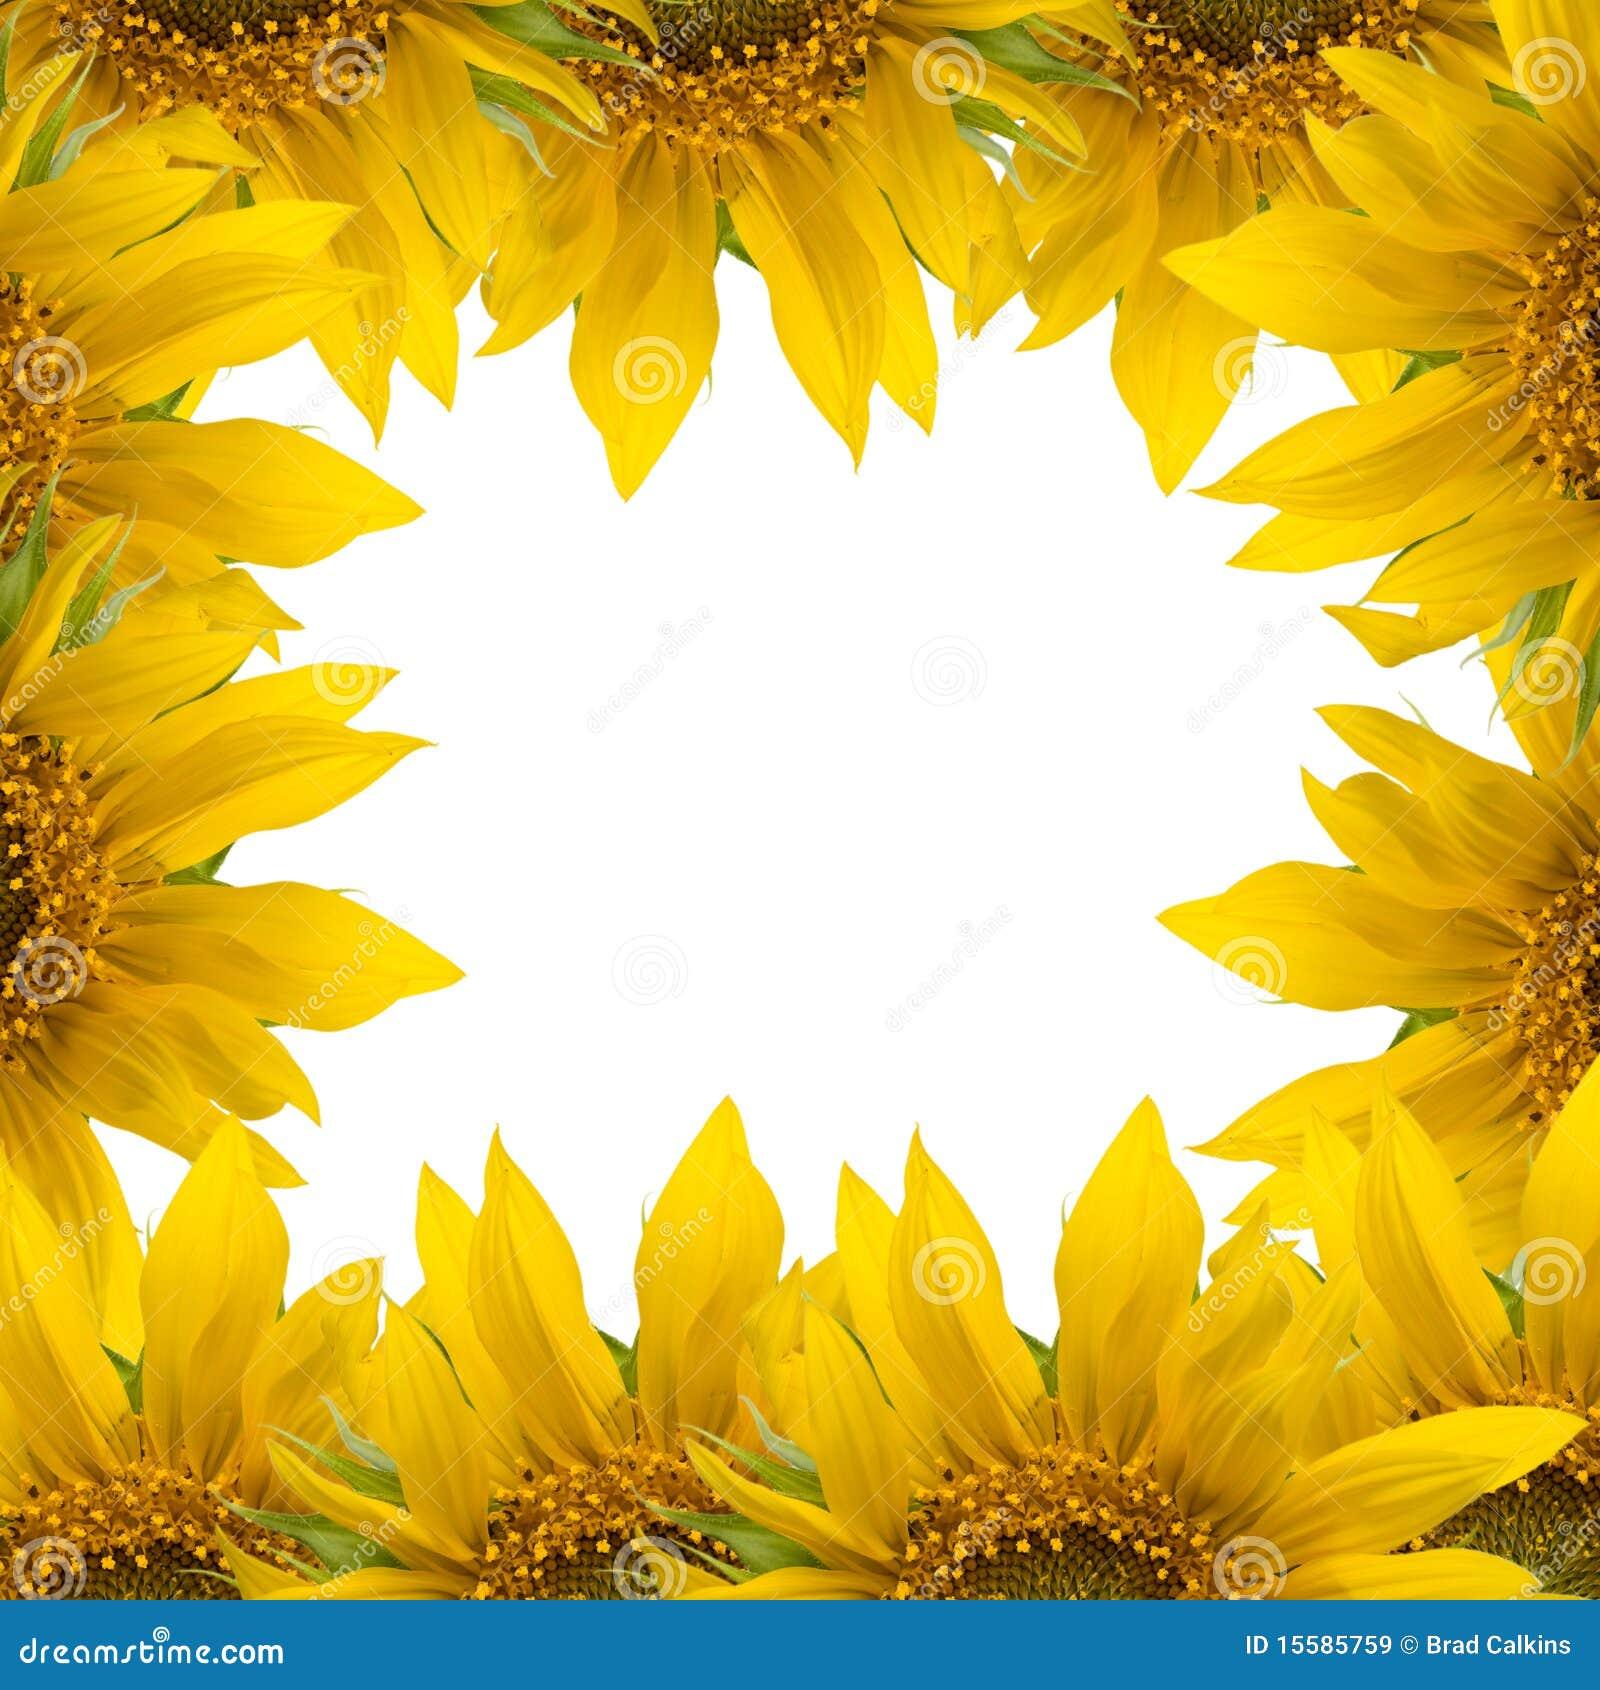 sunflower frame stock photo 15585759 megapixl - Sunflower Picture Frames